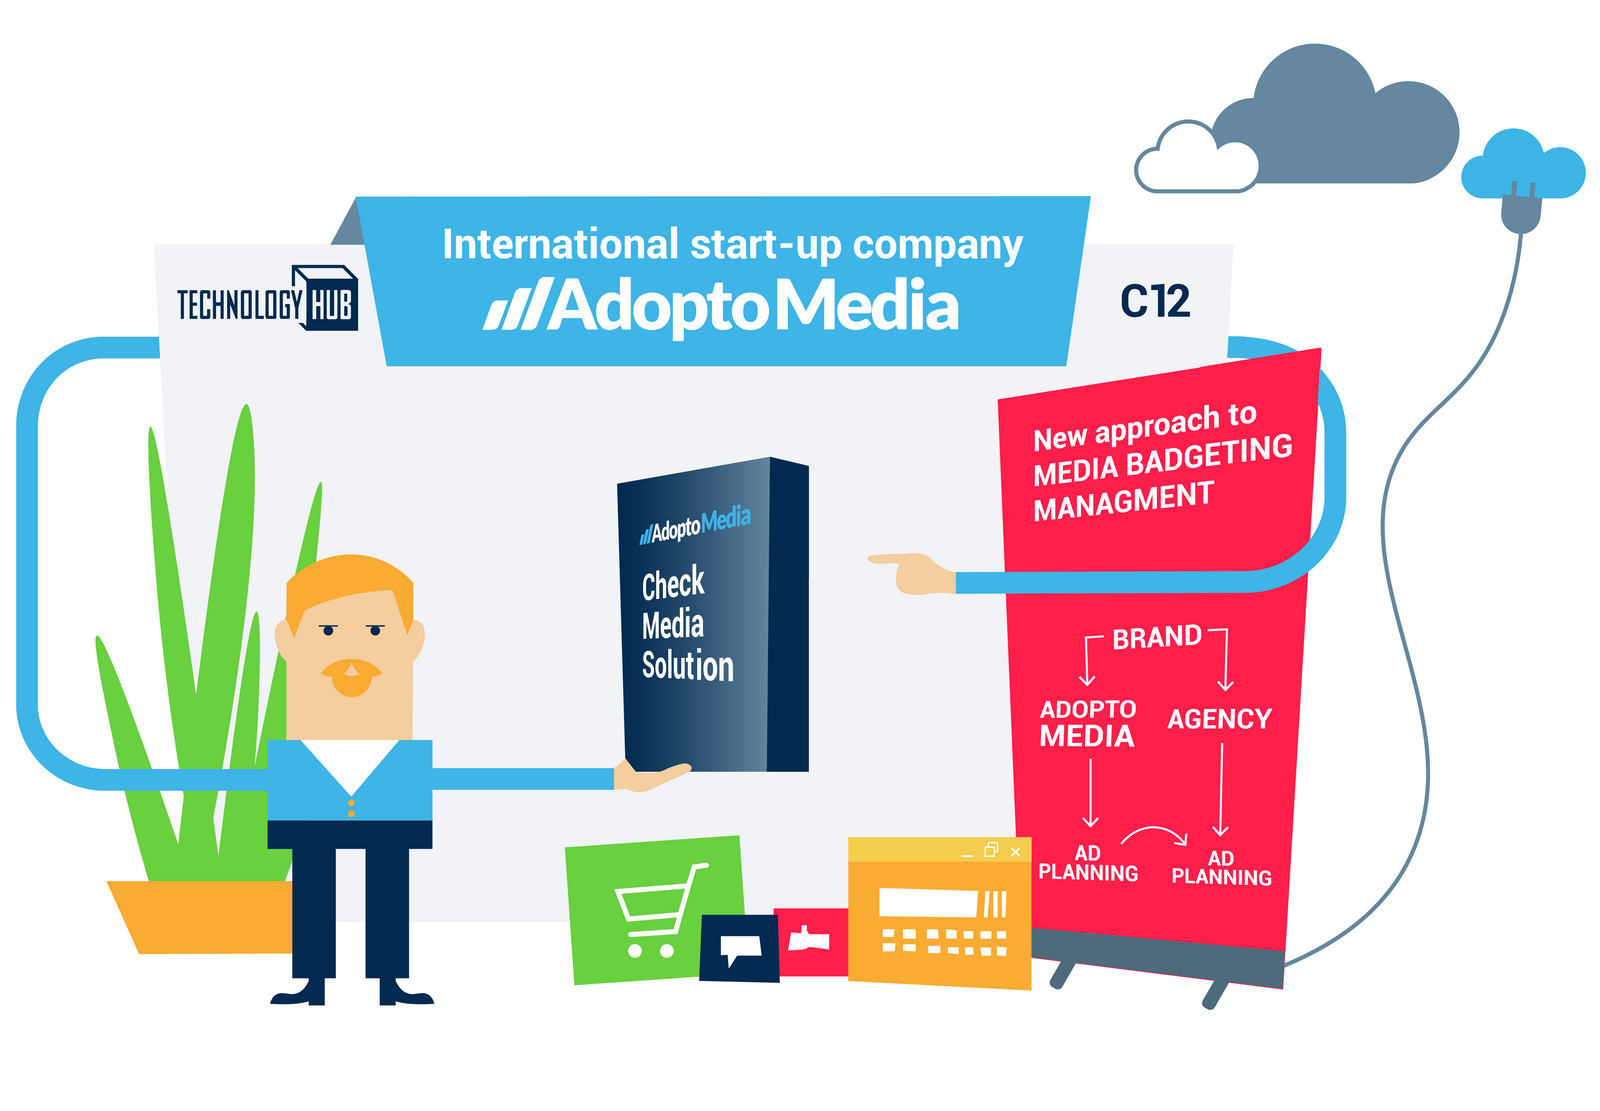 Technology HUB 2018, marketing, event, technological product, CheckMedia Solution, AdoptoMedia, advertising